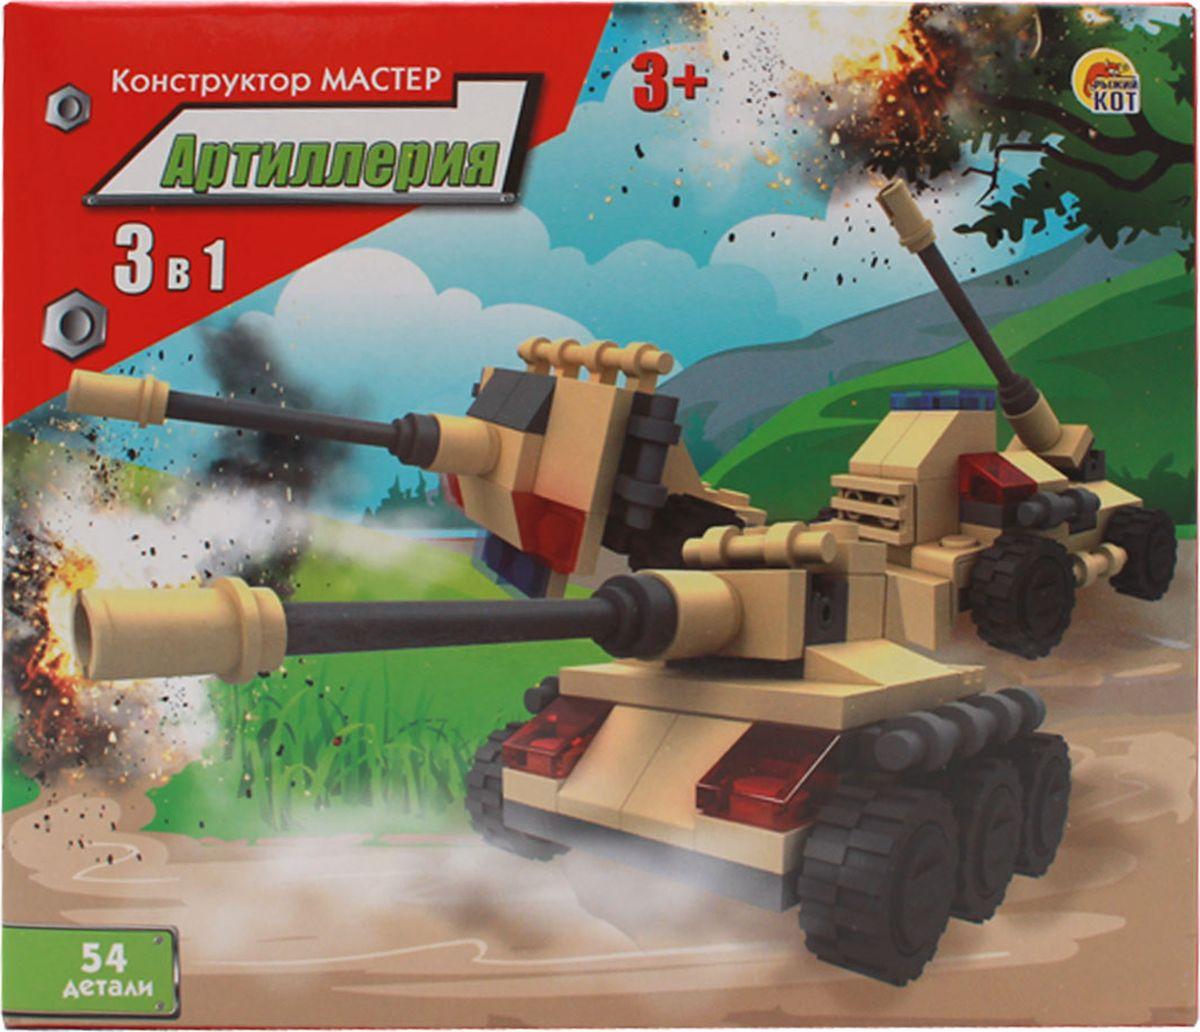 Рыжий Кот Конструктор 3 в 1 Артиллерия цена и фото